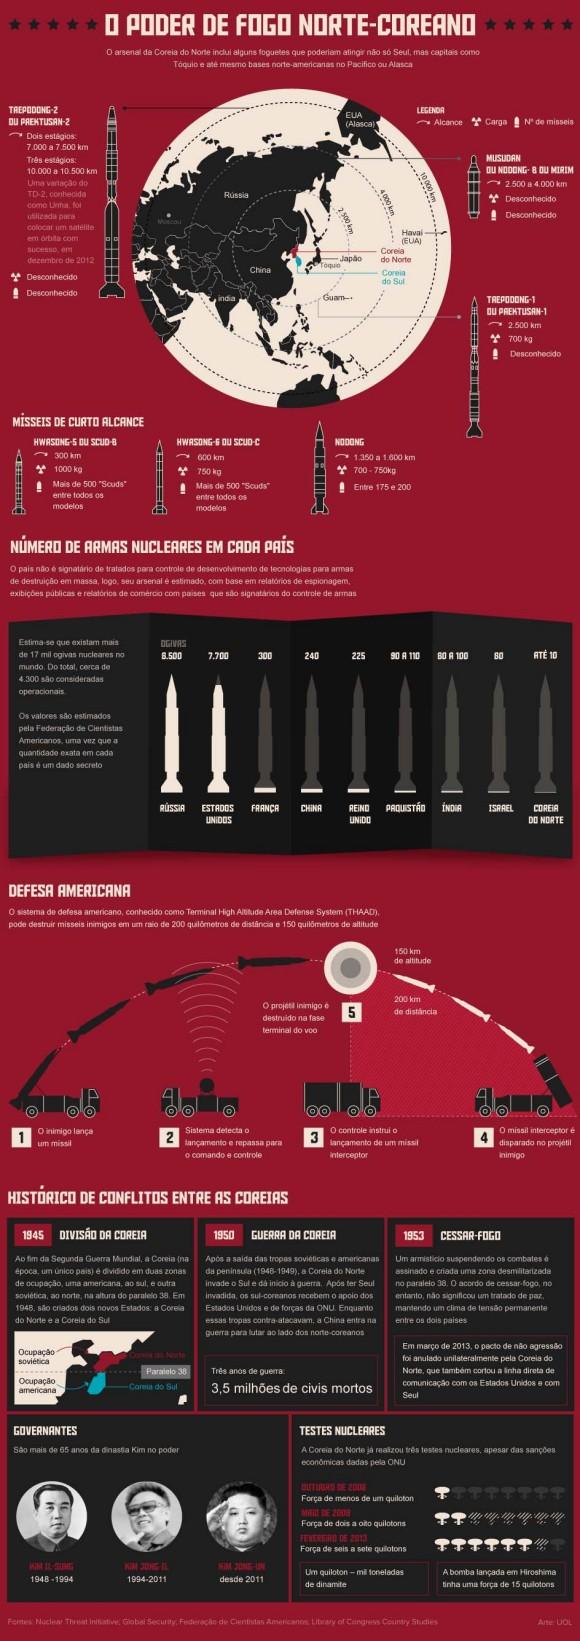 poder-de-fogo-norte-coreano - infográfico Uol